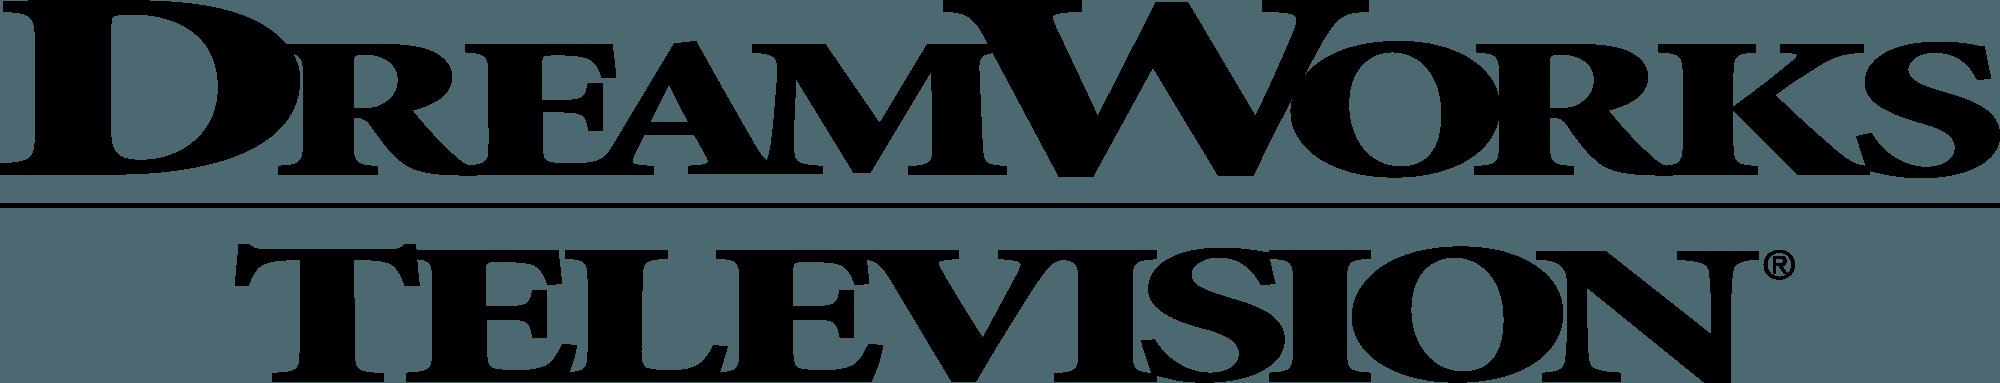 DreamWorks Television Logo - LogoDix